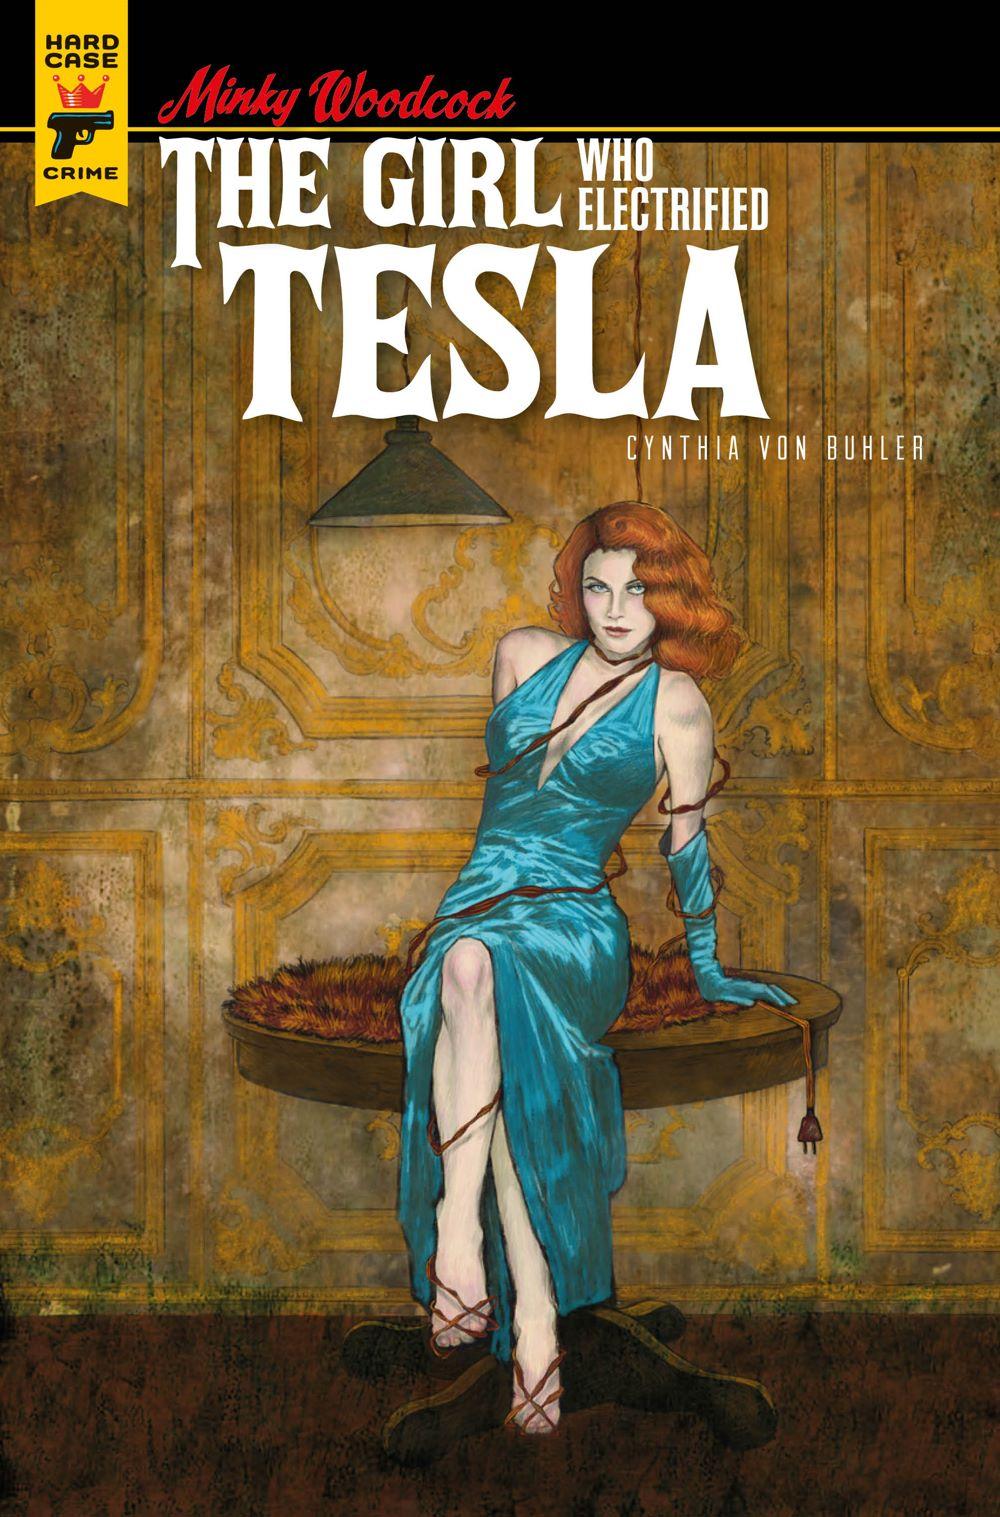 Minky-Woodcock-Cover-D-Cynthia-von-Buhler ComicList Previews: MINKY WOODCOCK THE GIRL WHO ELECTRIFIED TESLA #1